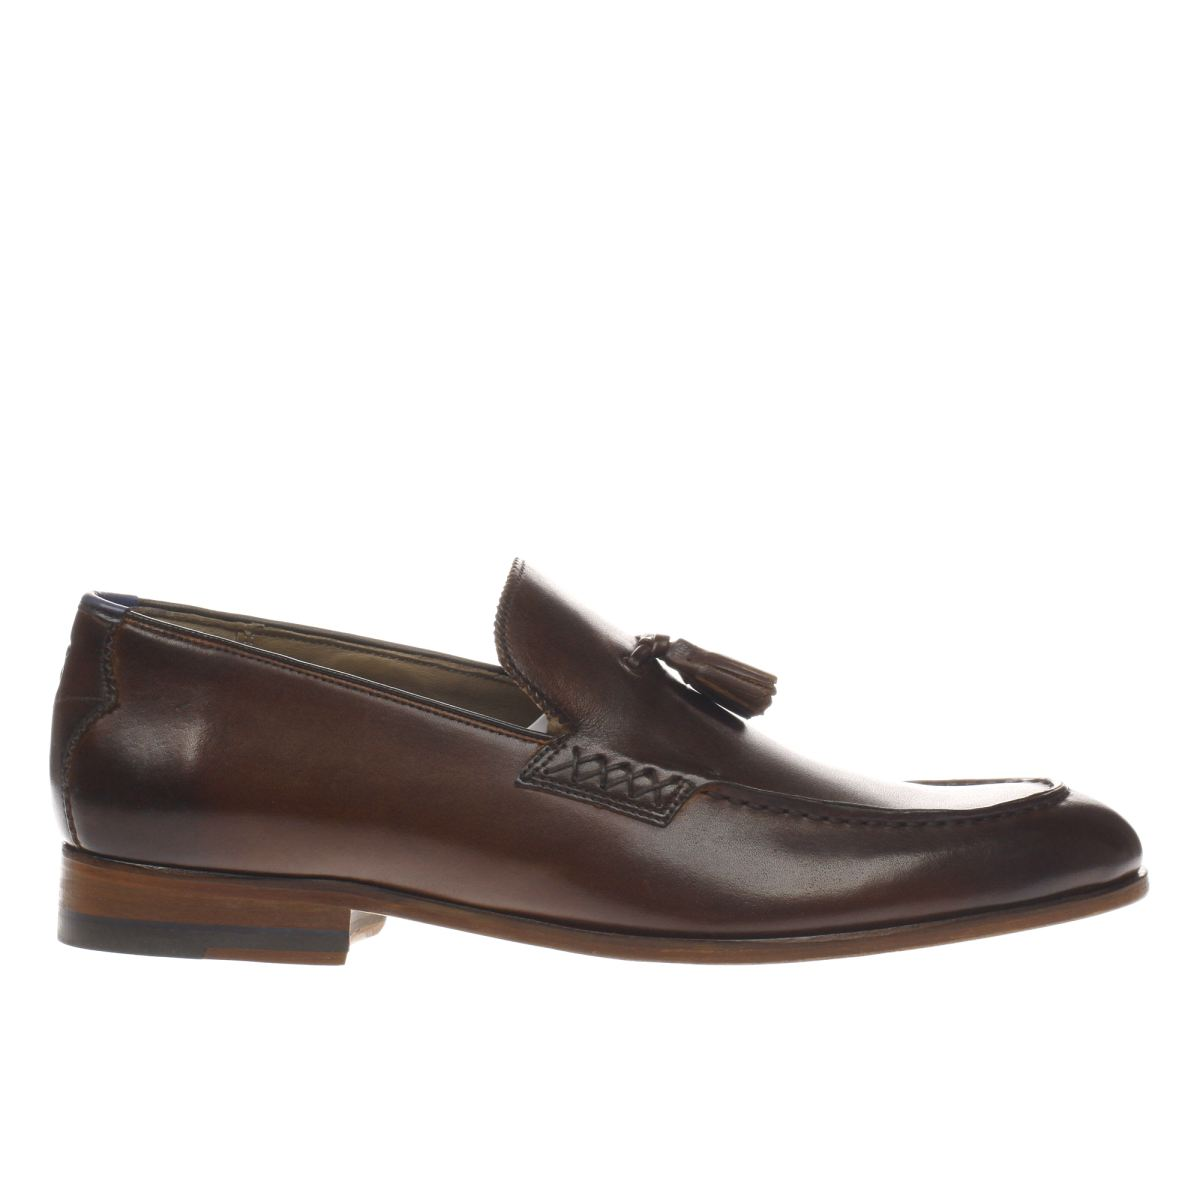 Oliver Sweeney Oliver Sweeney Dark Brown Belton Shoes